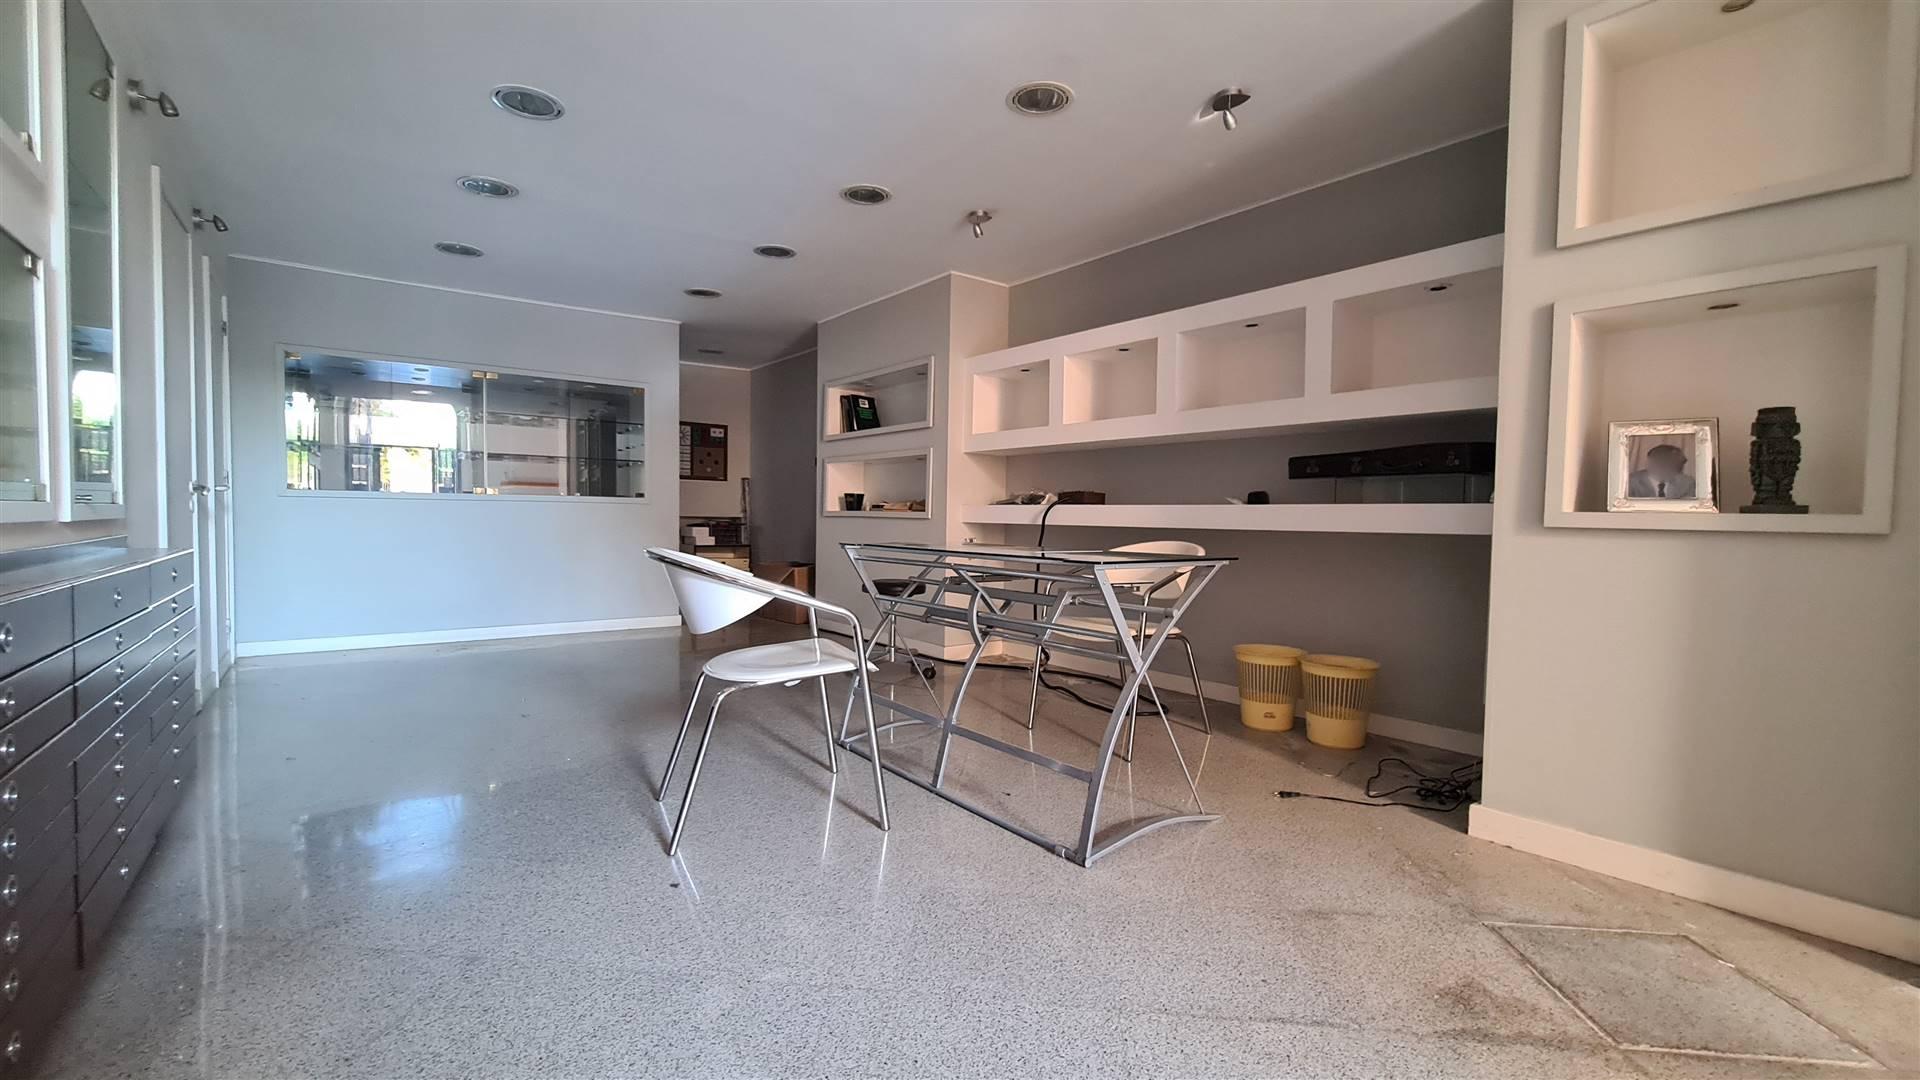 LF241-Locale Commerciale-SANTA-MARIA-CAPUA-VETERE-Corso-Ugo-de-Carolis